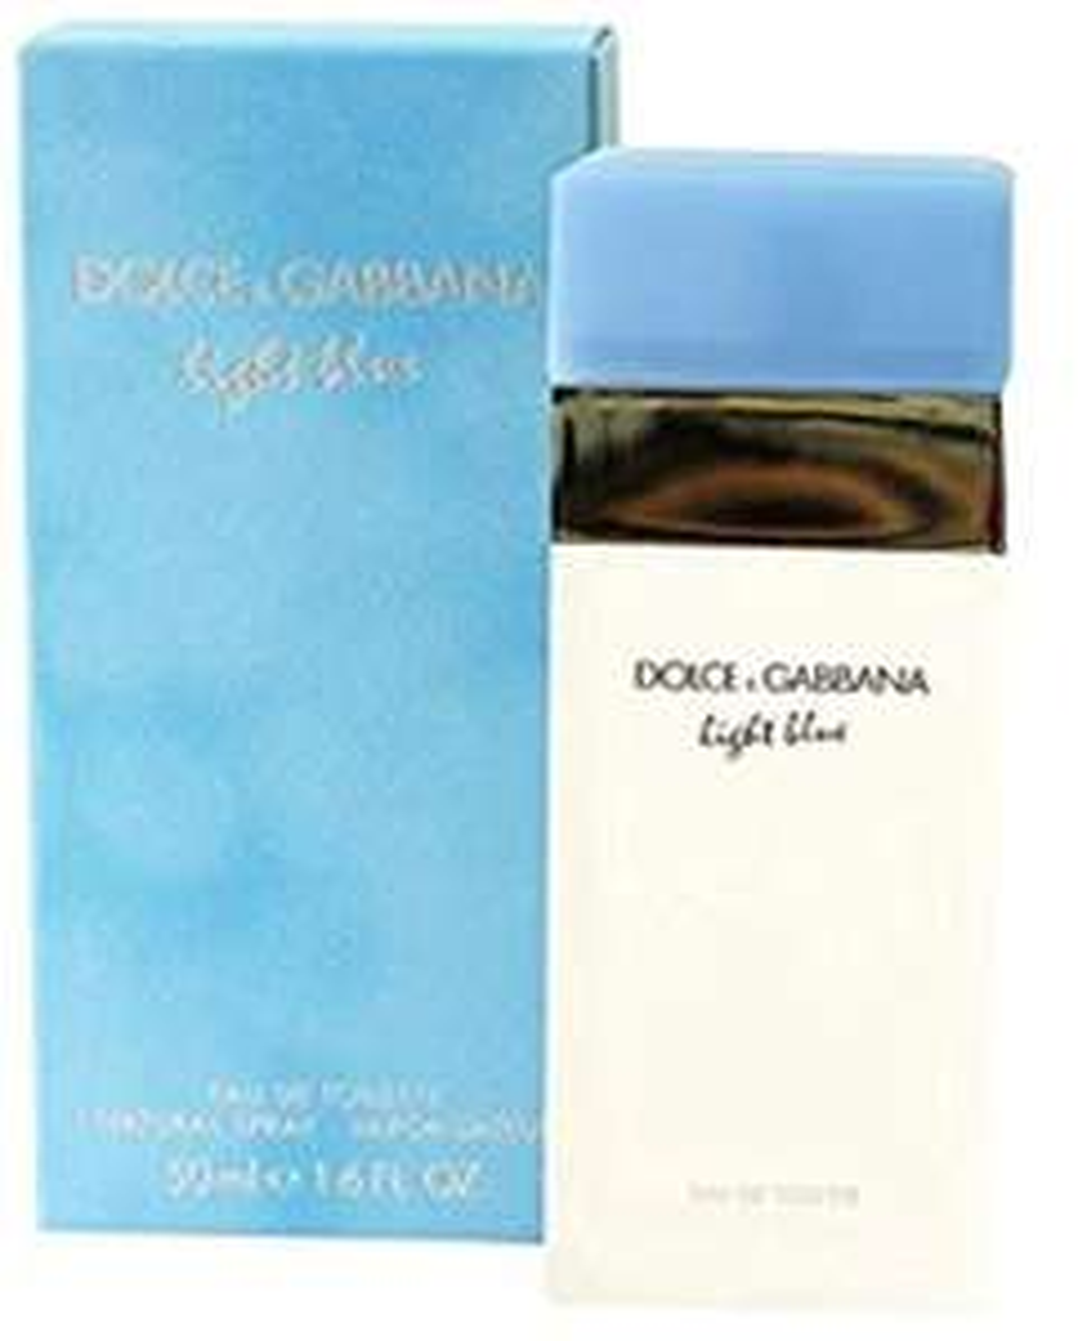 Dolce & Gabbana Light Blue Eau de Toilette for Women 50ml  £27.99 - Argos